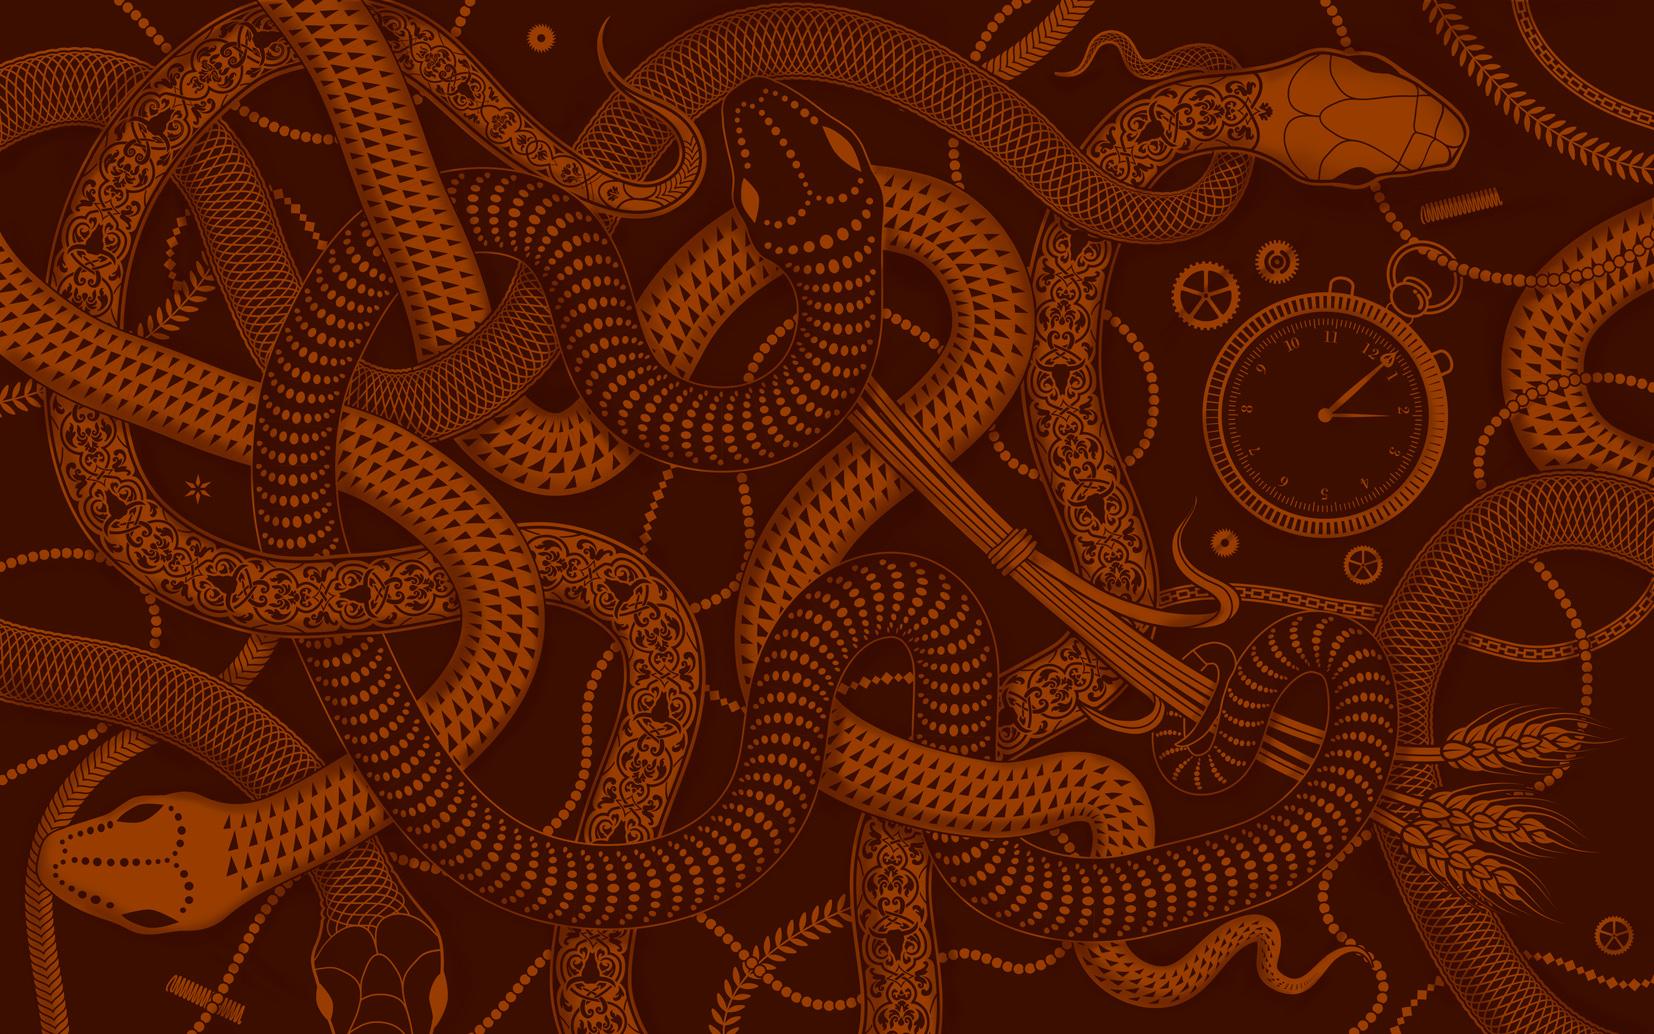 October Snakes